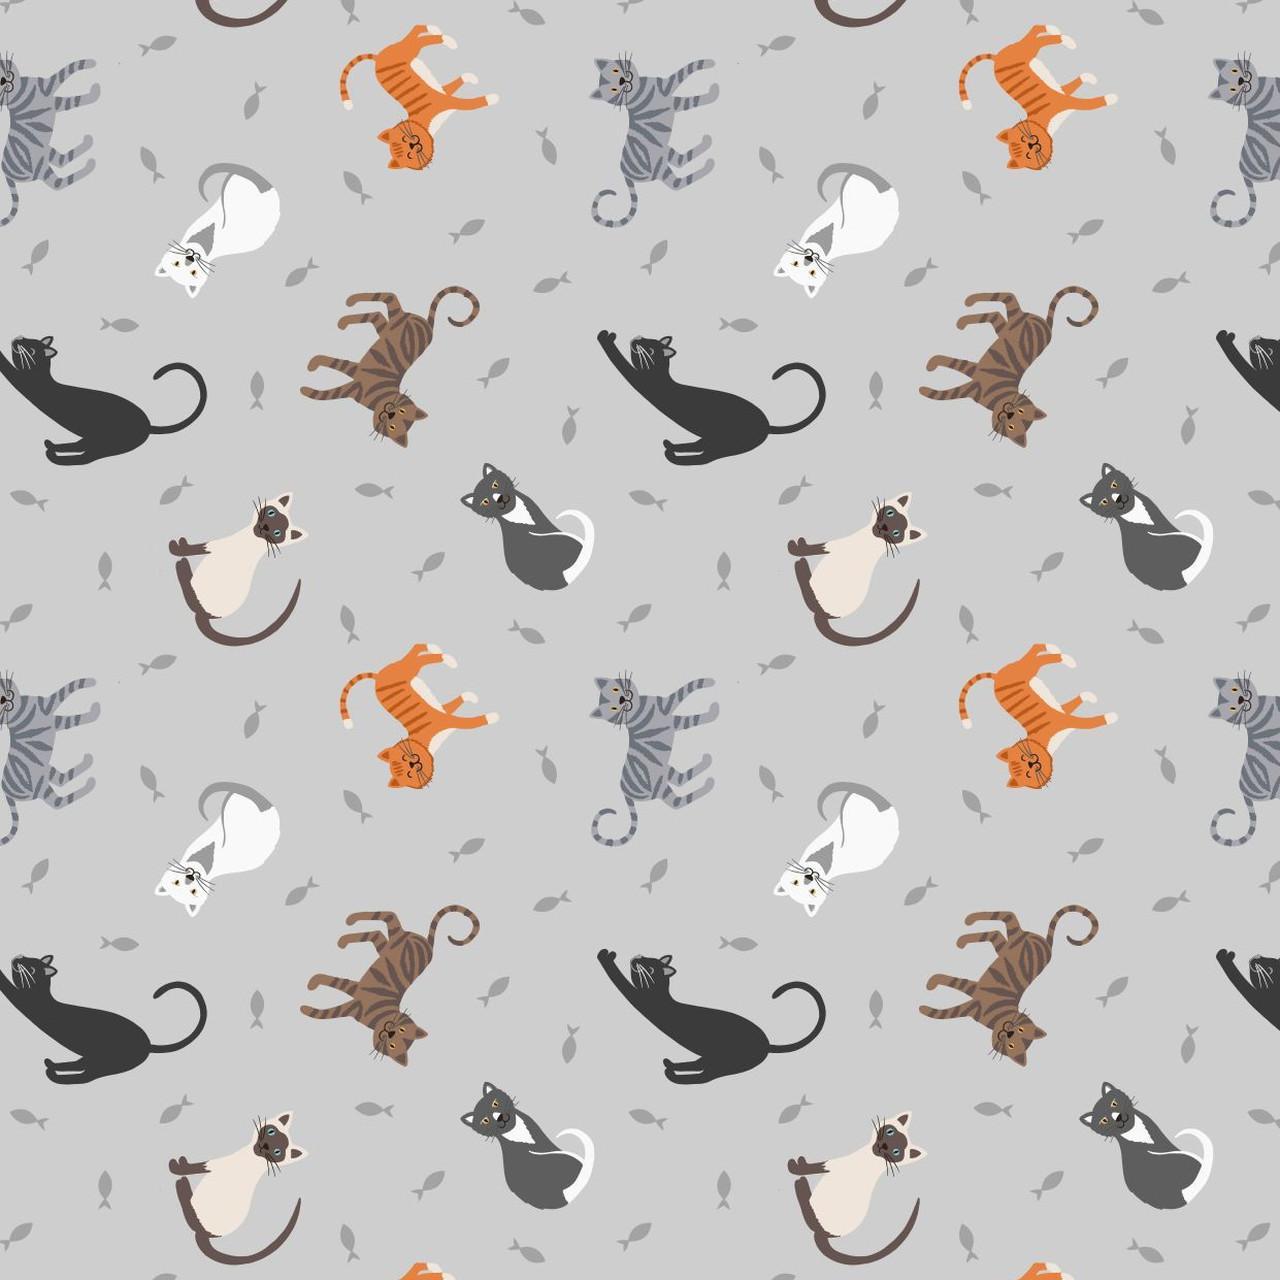 Petits chats lewis irene